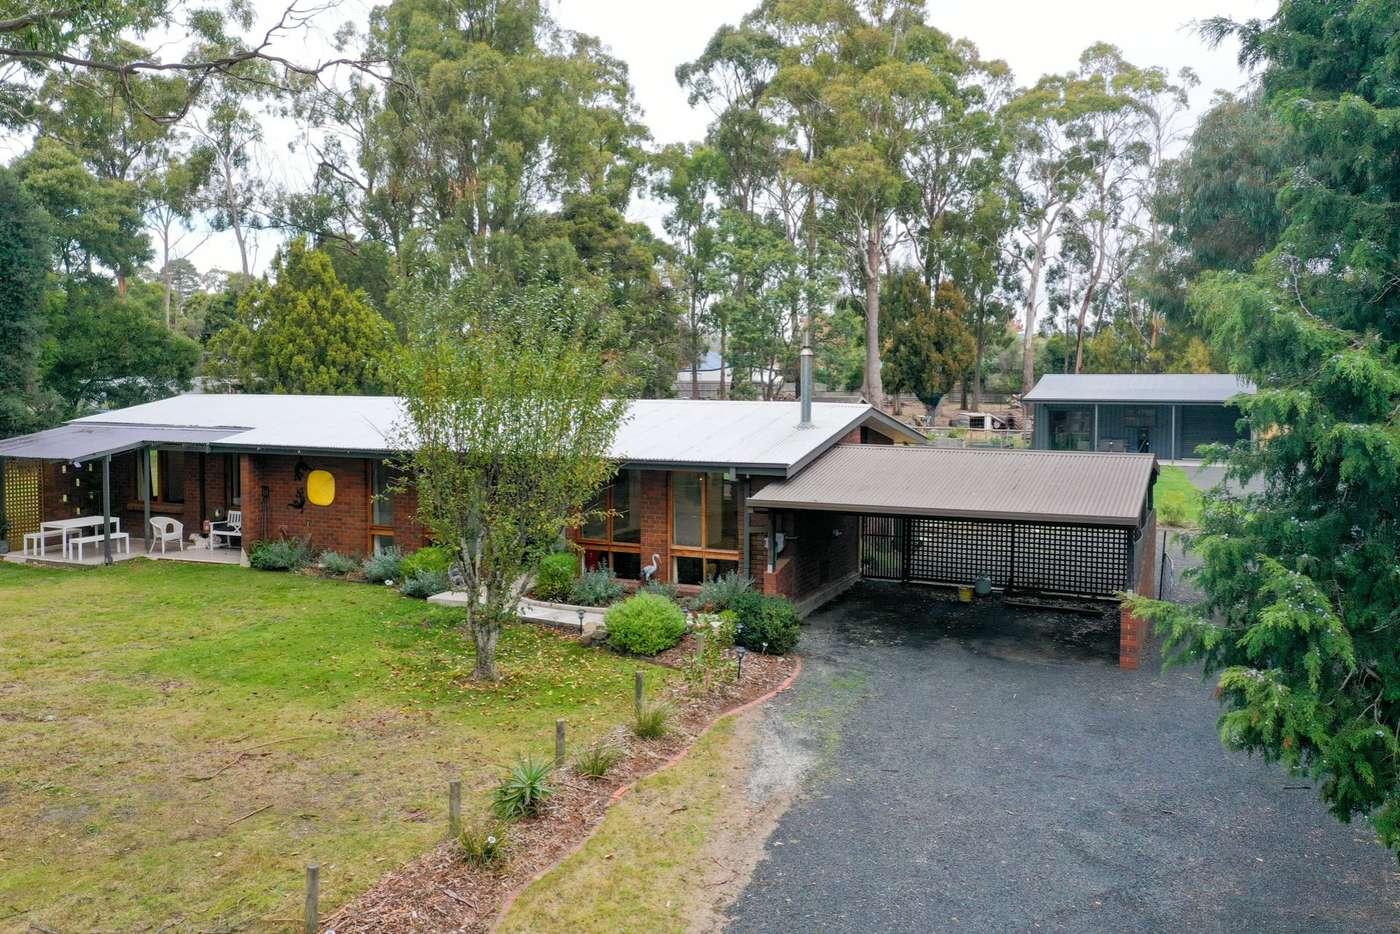 Main view of Homely house listing, 12 Nobelius Drive, Legana TAS 7277